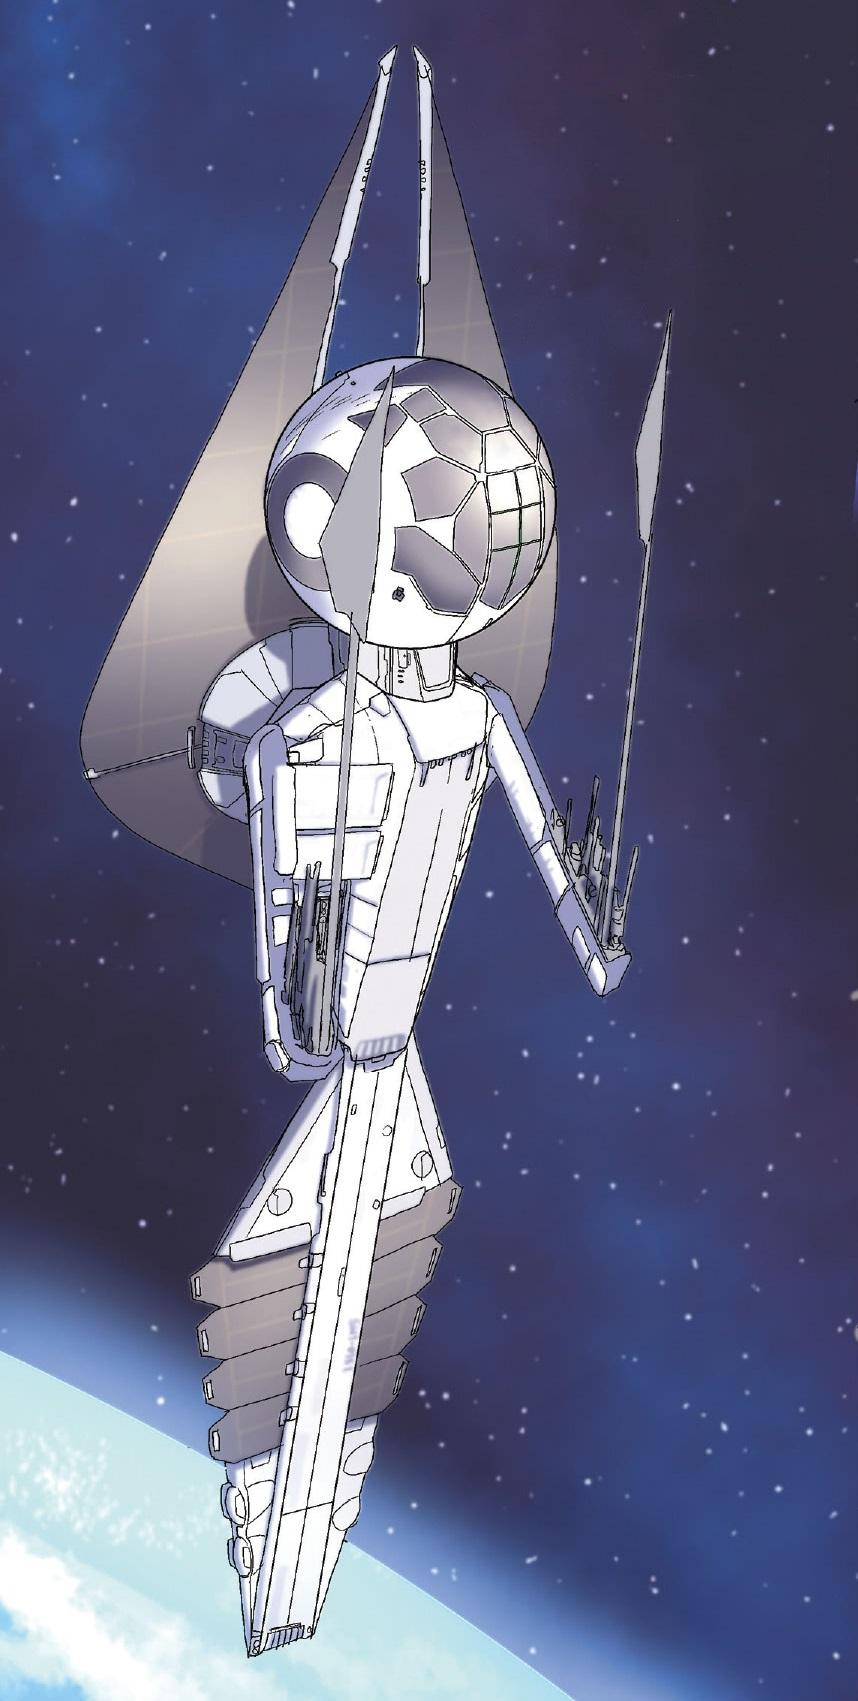 Stark Space Station